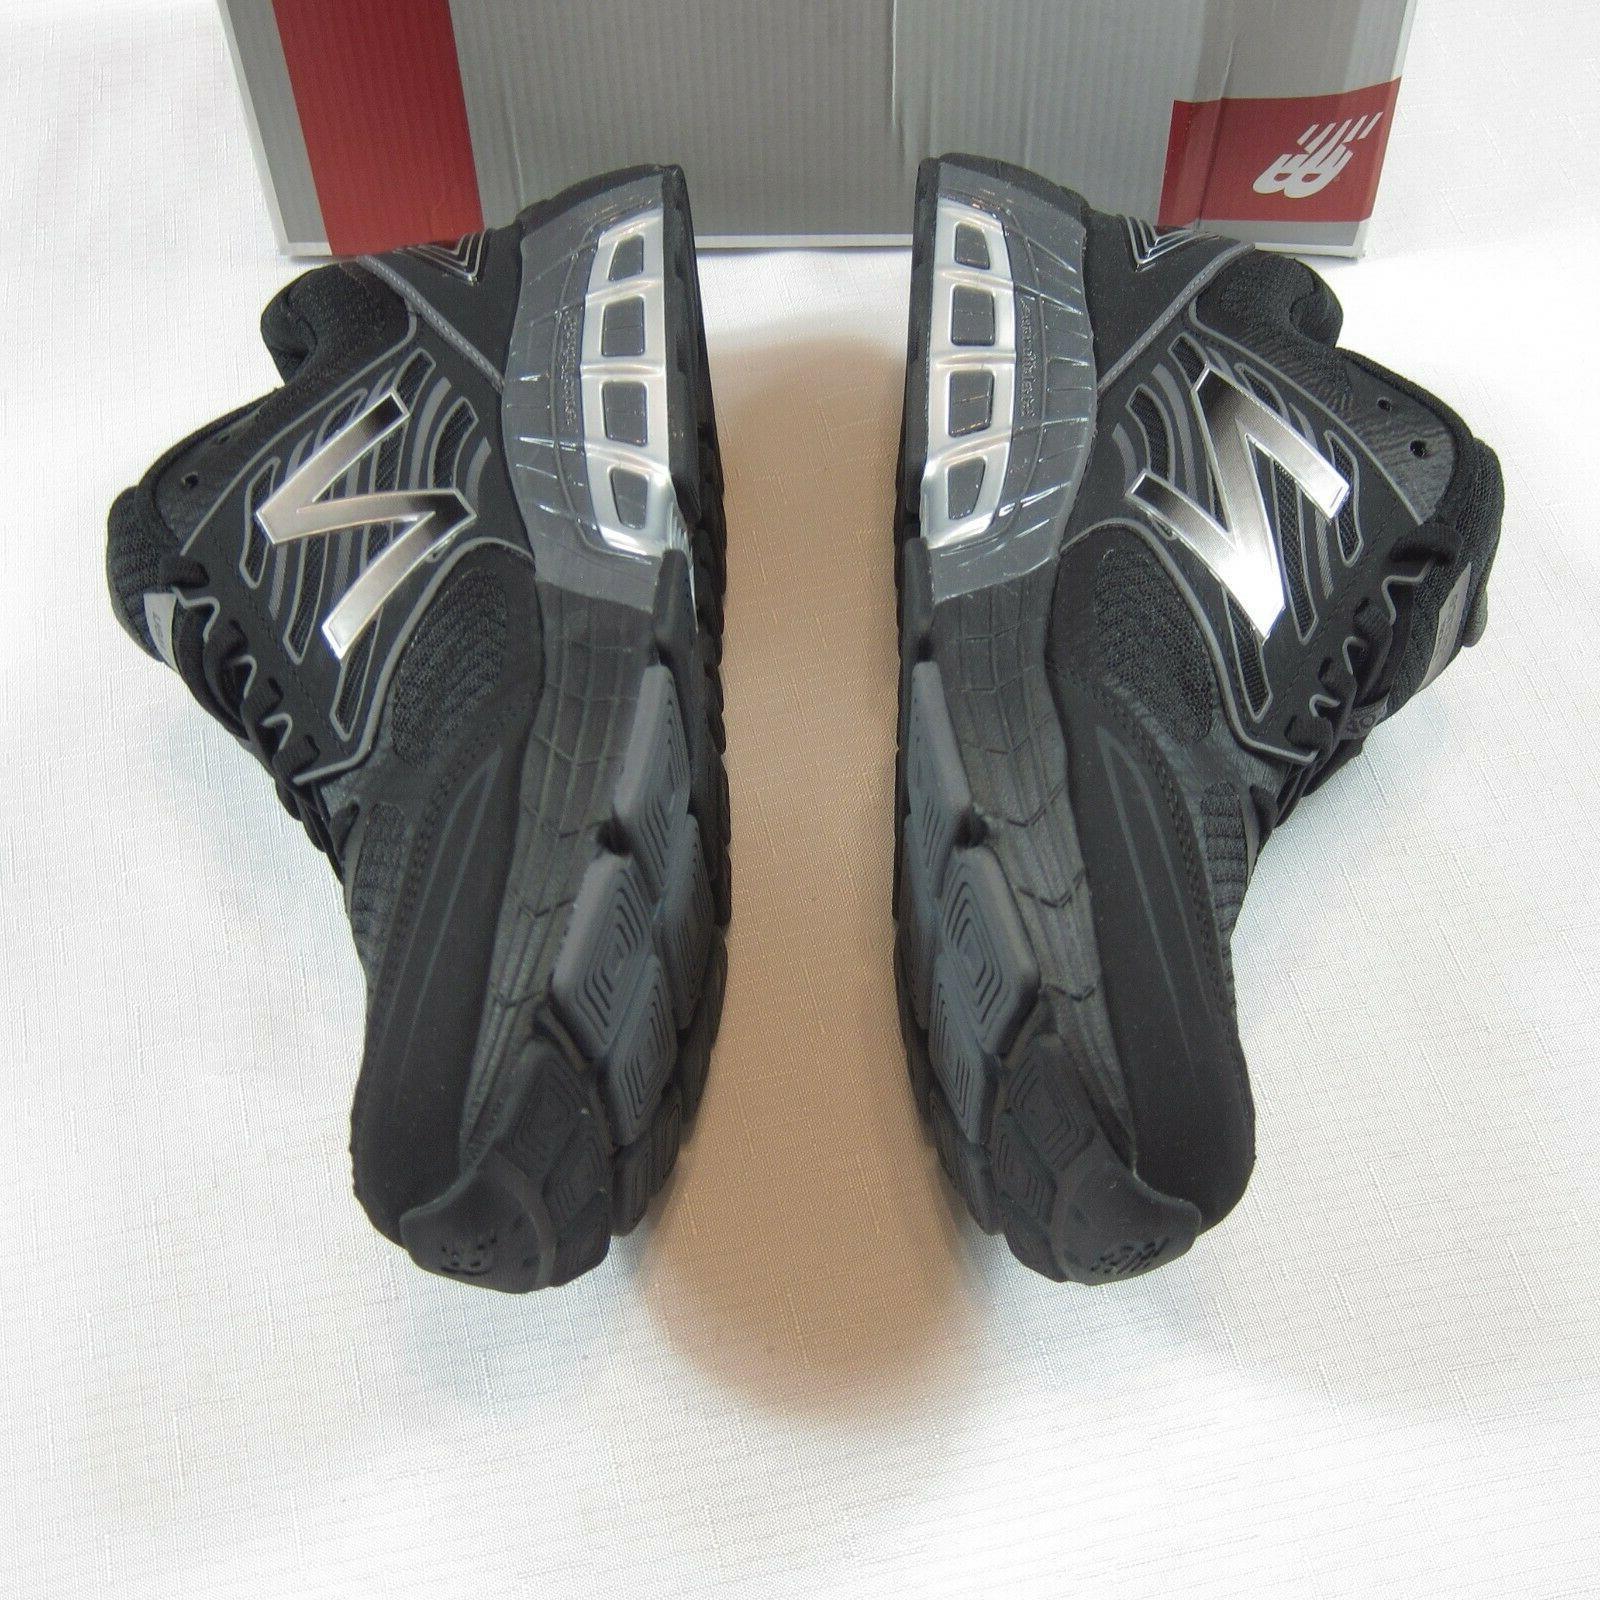 New Sneakers Mens Black Grey NEW $140